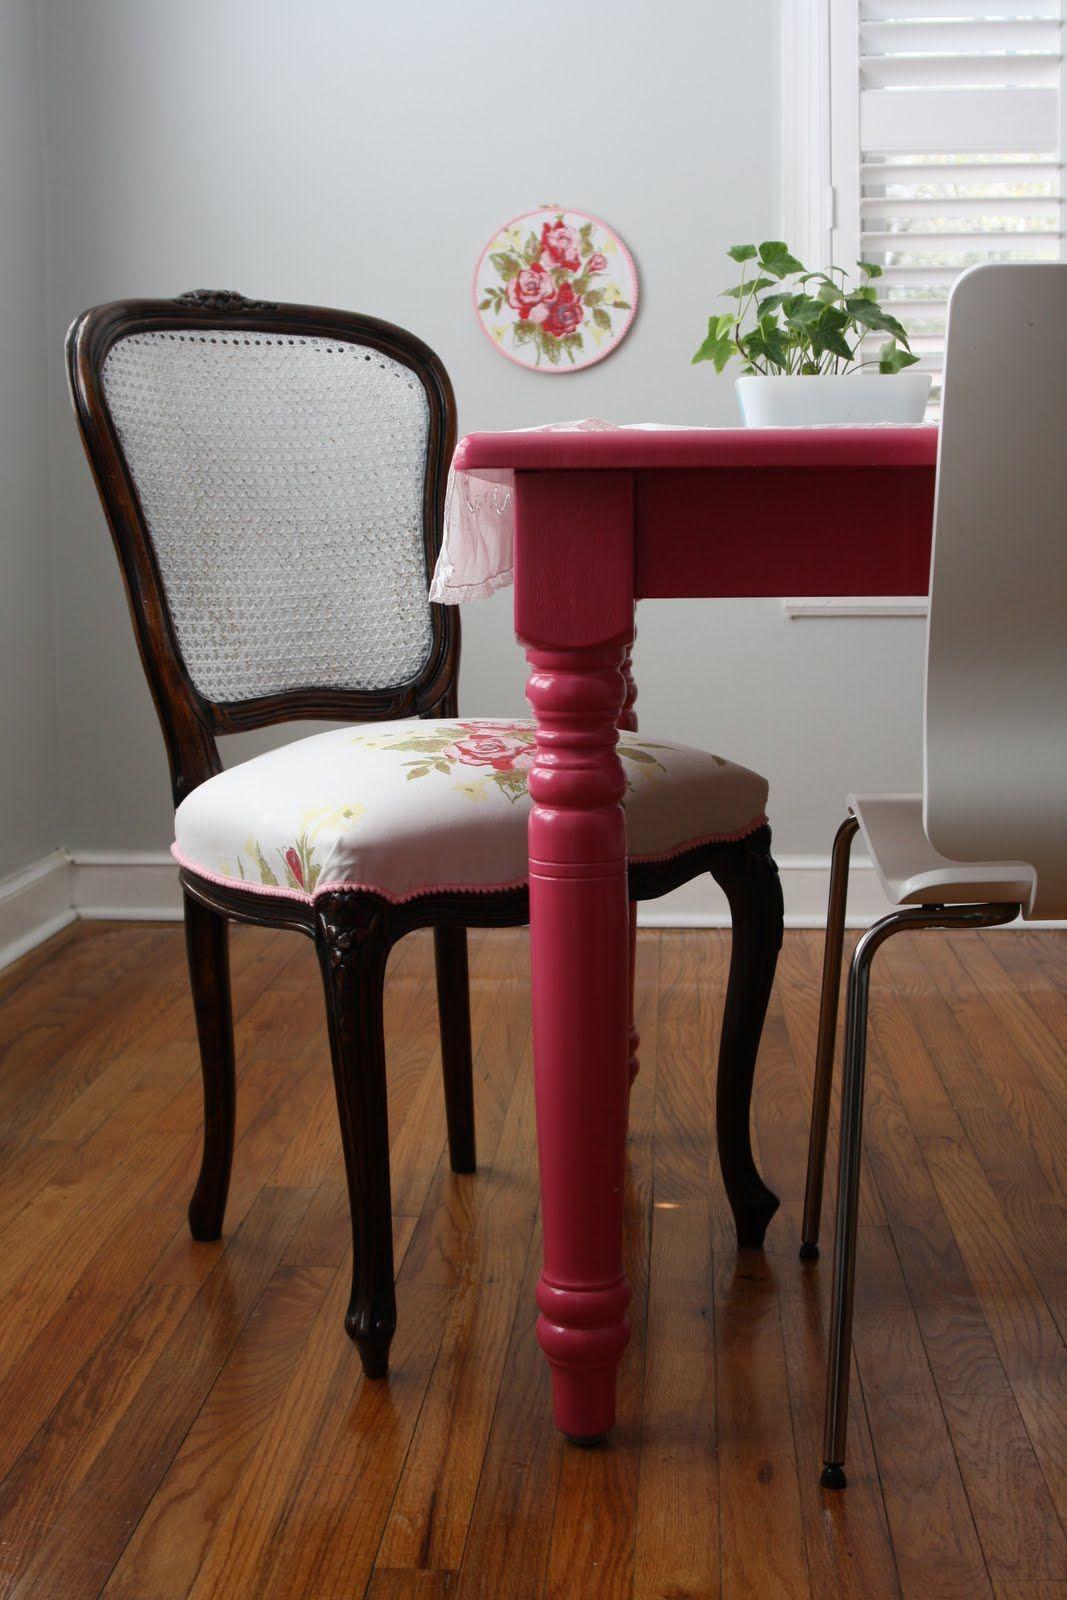 Stunning DIY Dining Room Chair Upholstery 1067 X 1600 169 KB Jpeg